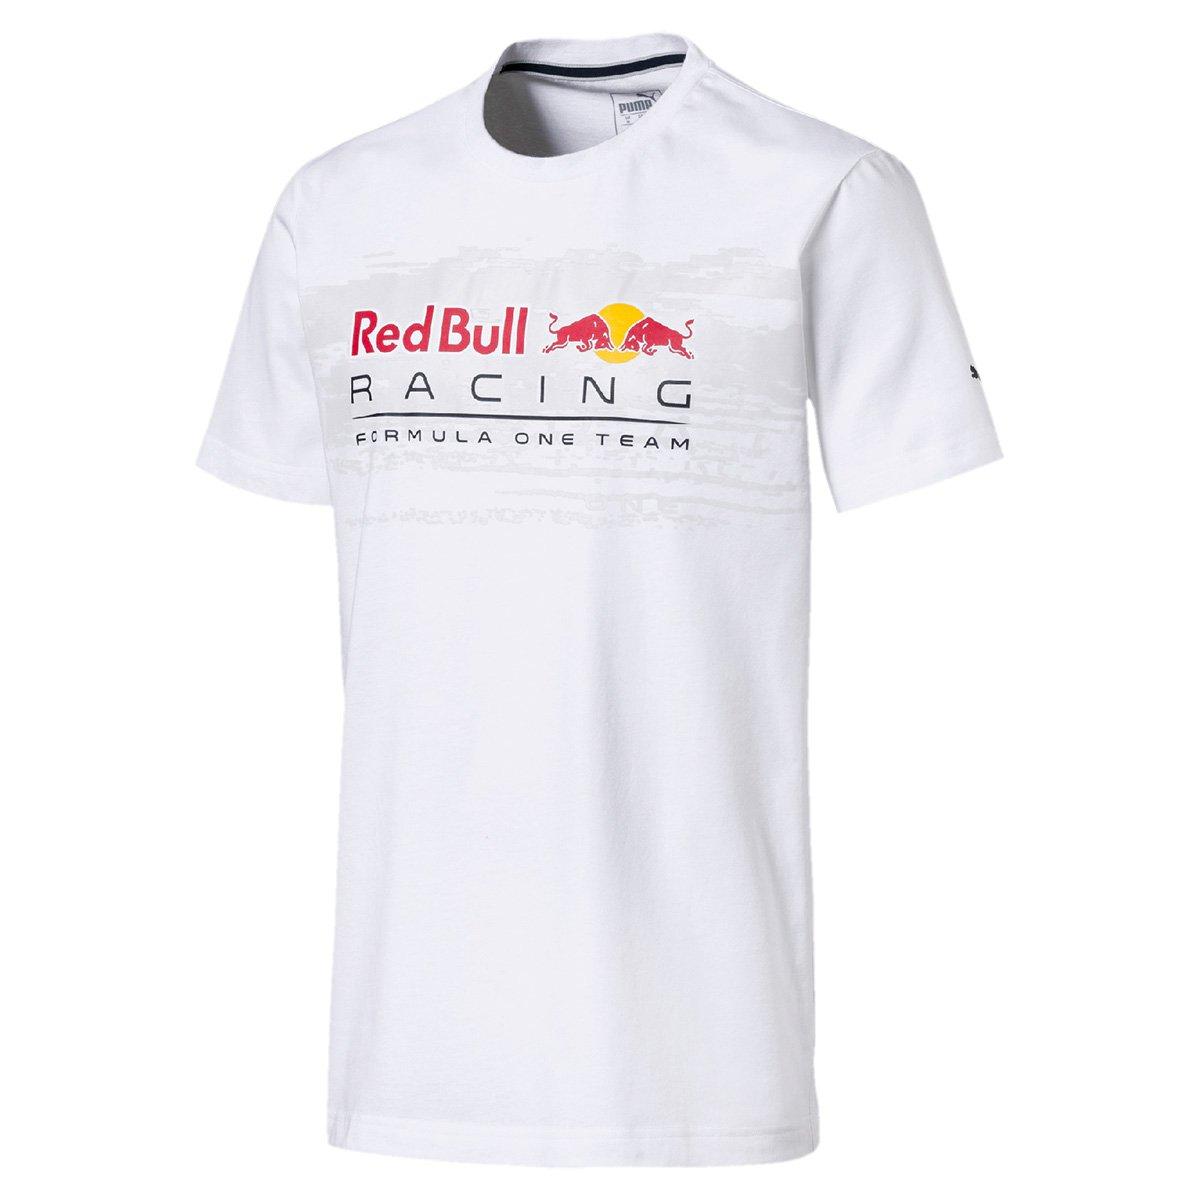 Camiseta Puma Red Bull Racing Logo Tee Masculina 0e8cefa2ba1